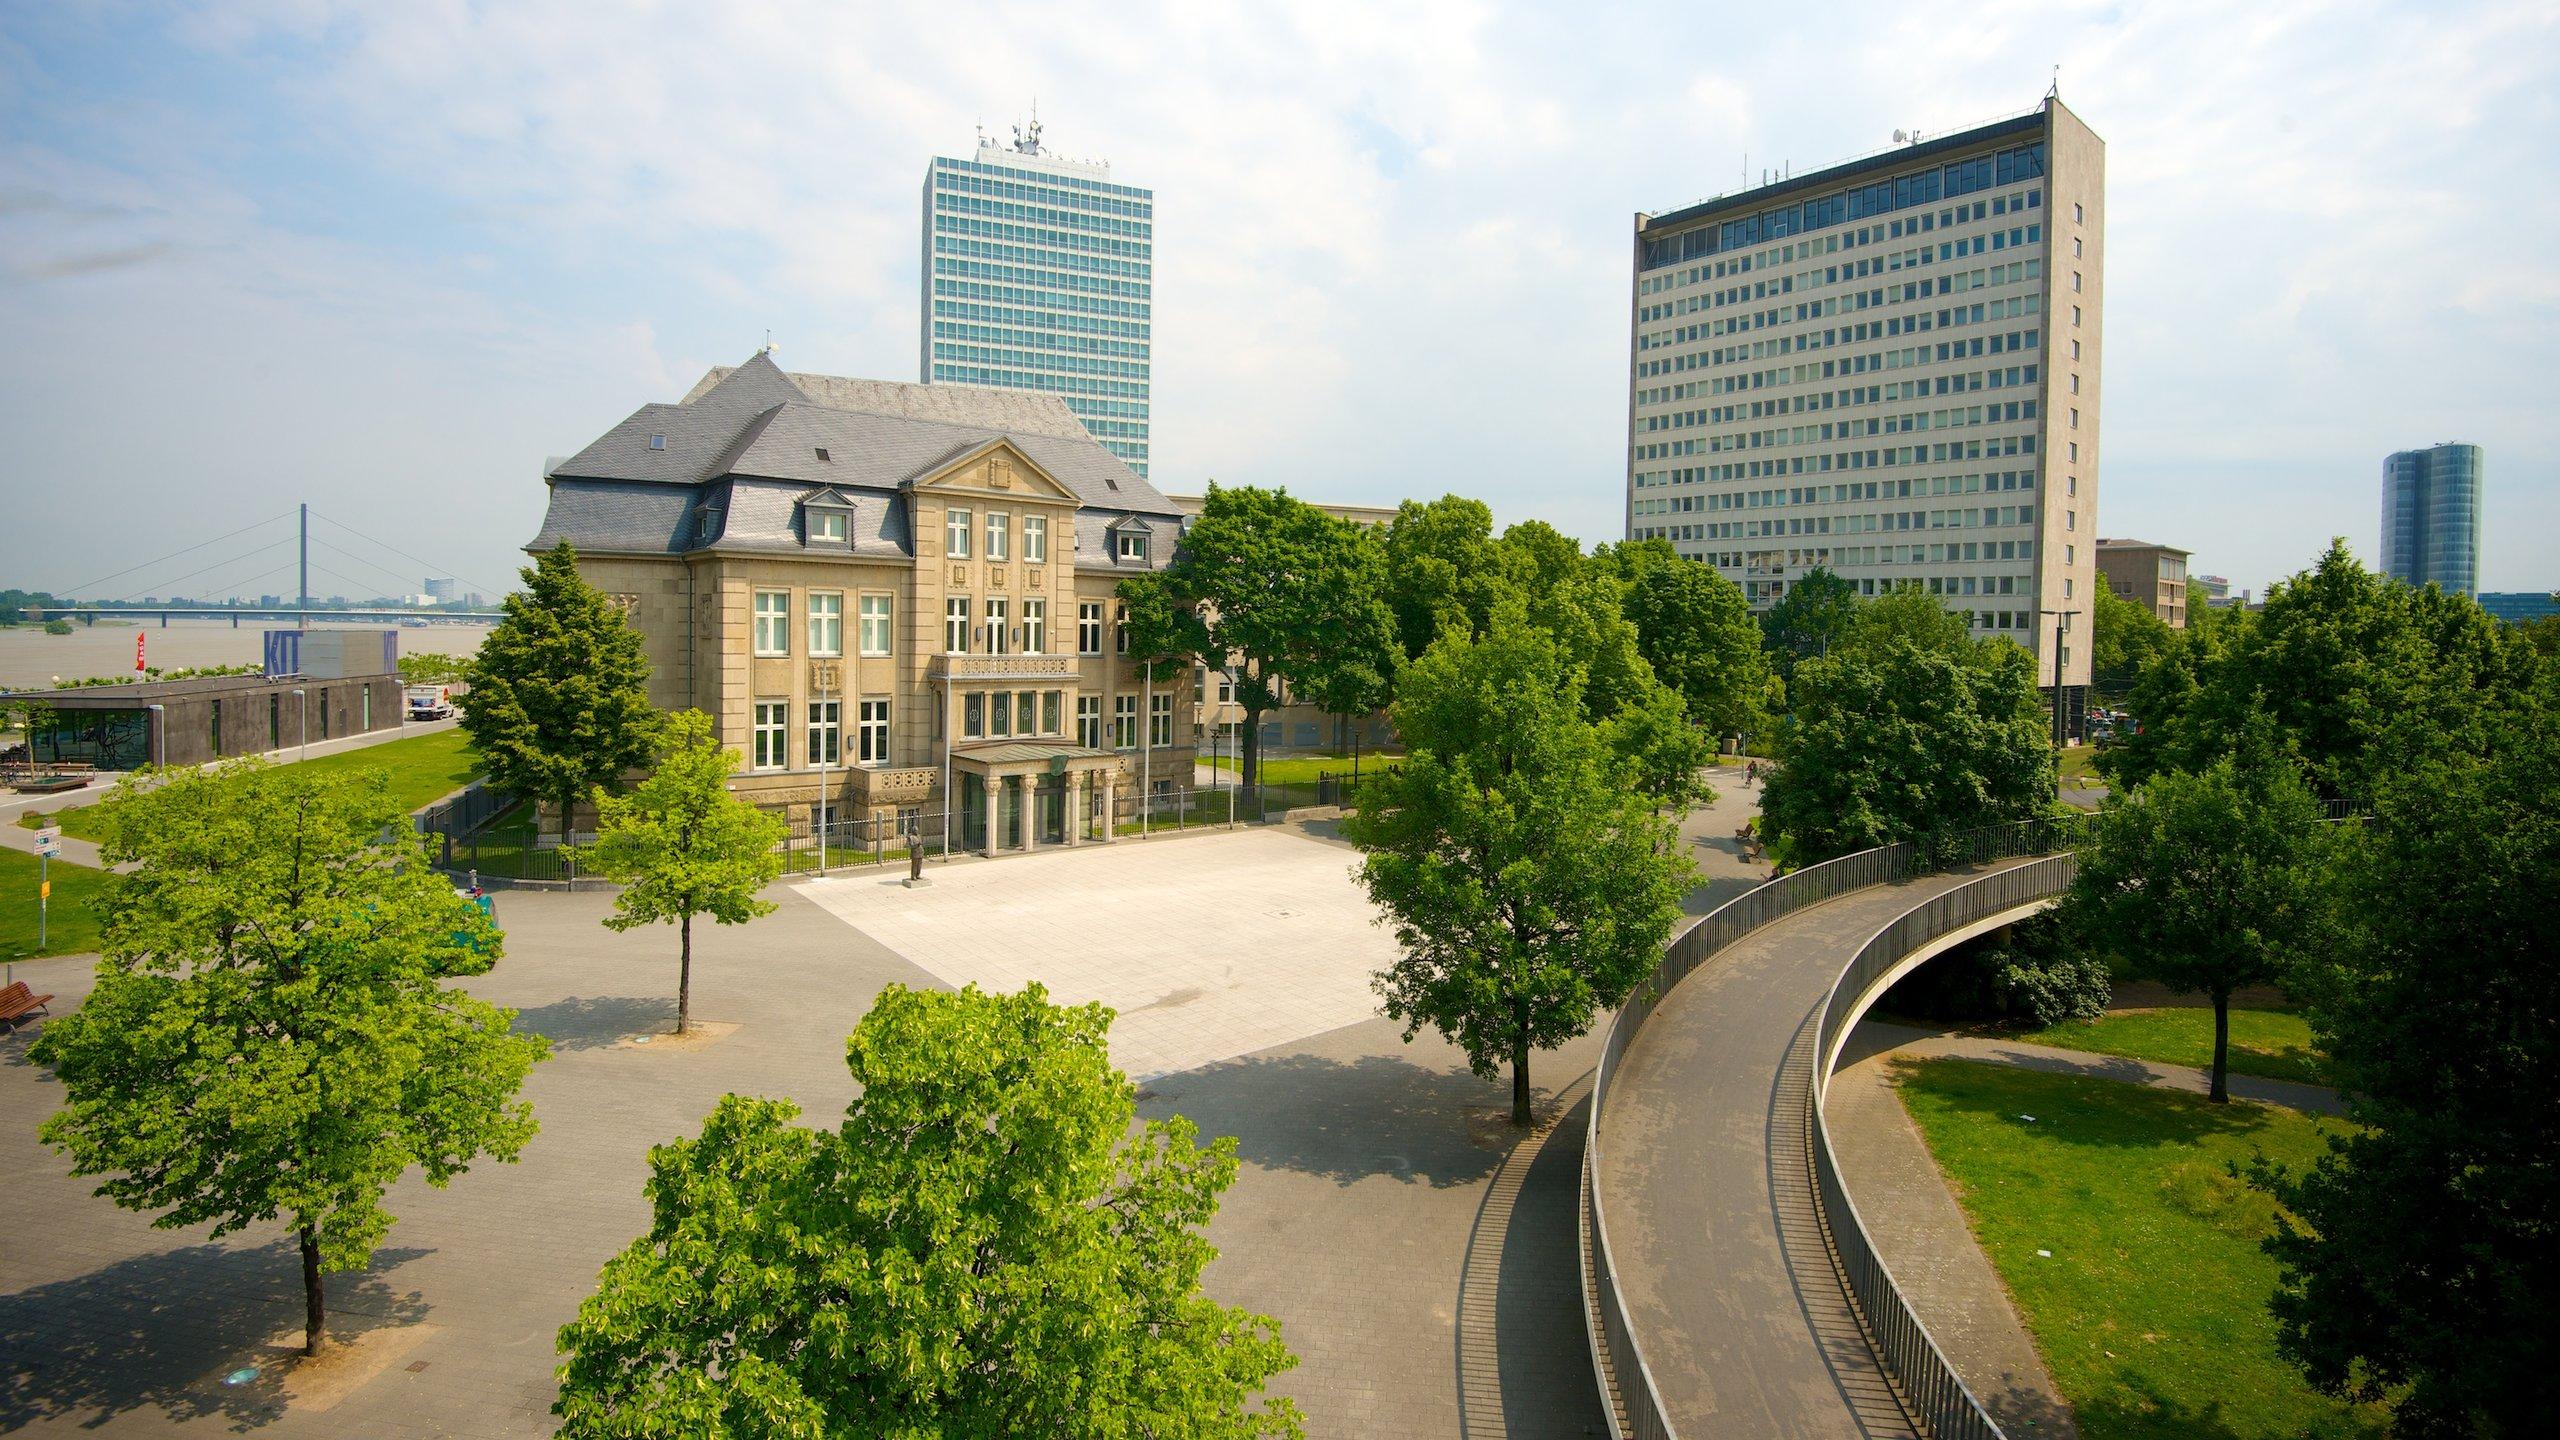 Düsseldorf, North Rhine-Westphalia, Germany